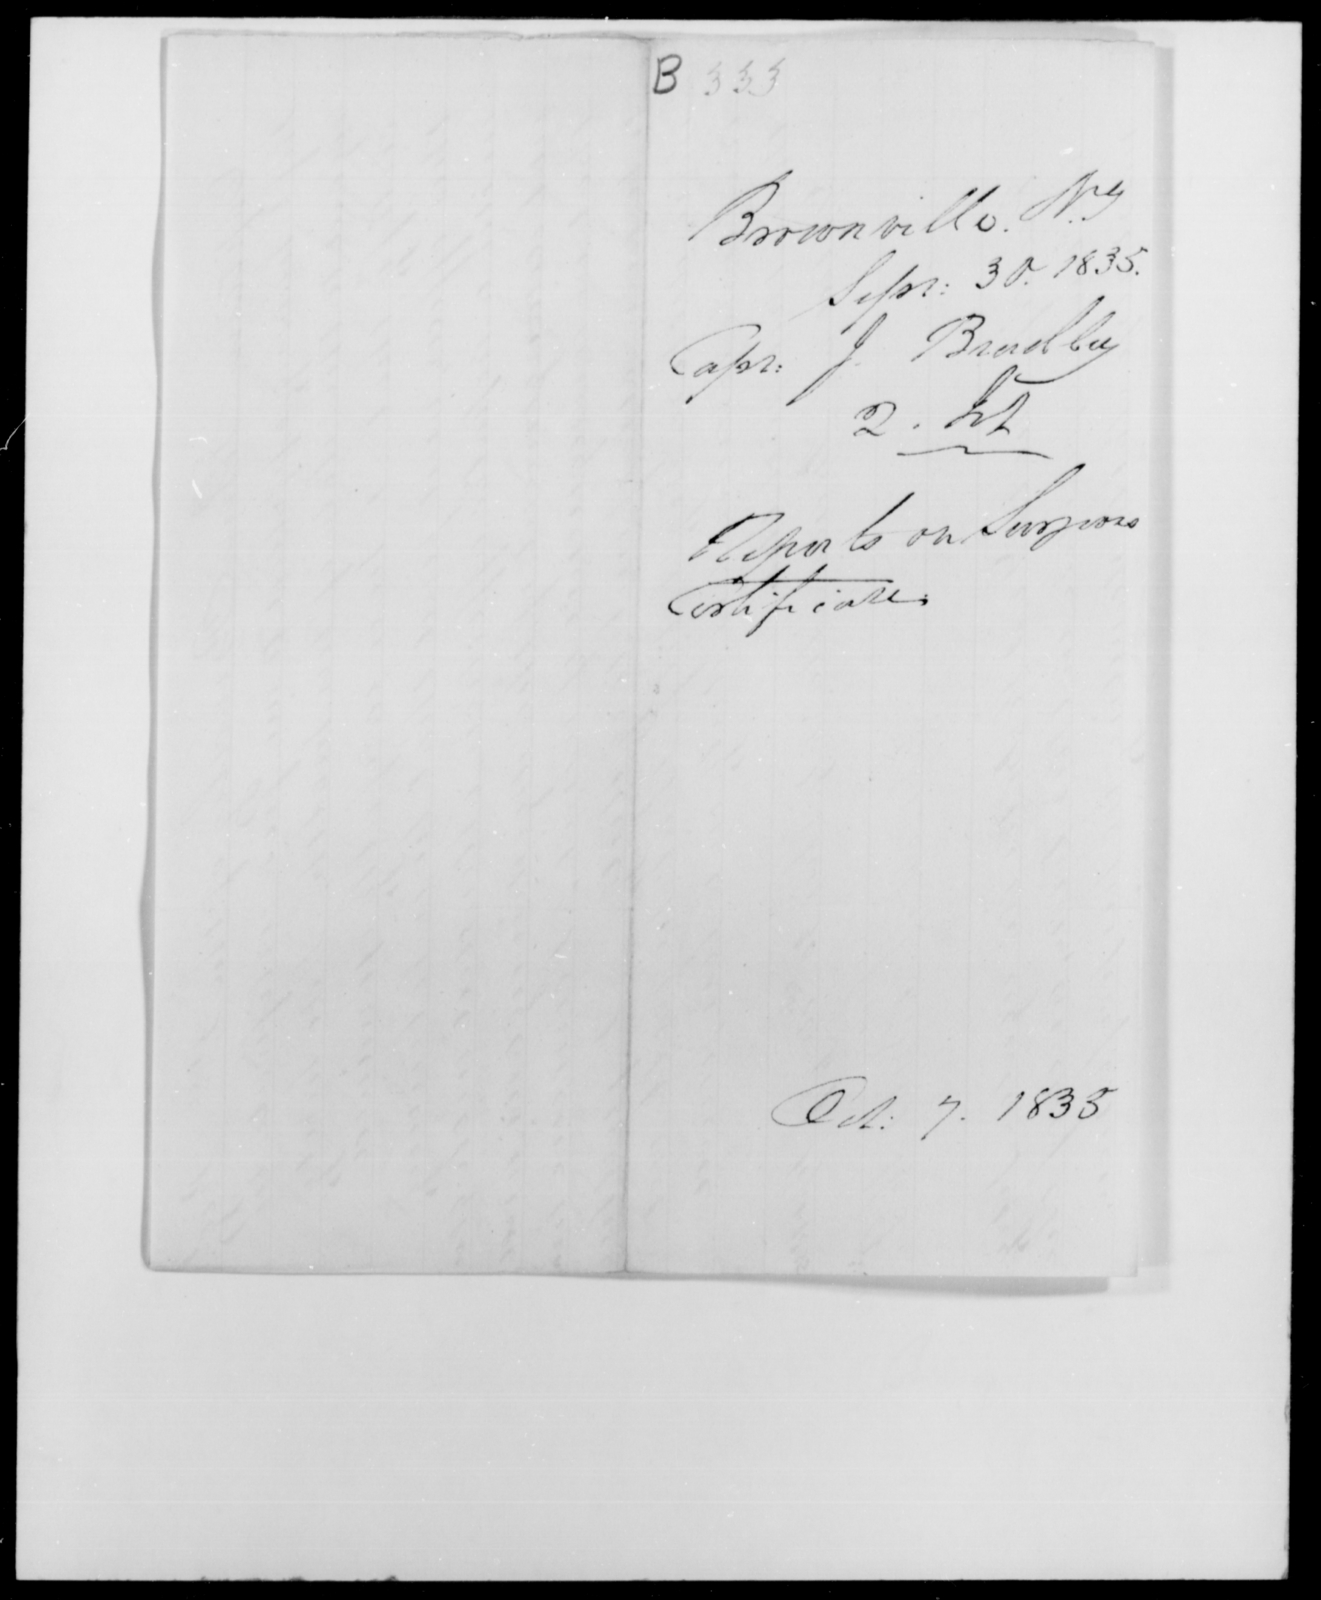 Bradley, J - State: New York - Year: 1835 - File Number: B333